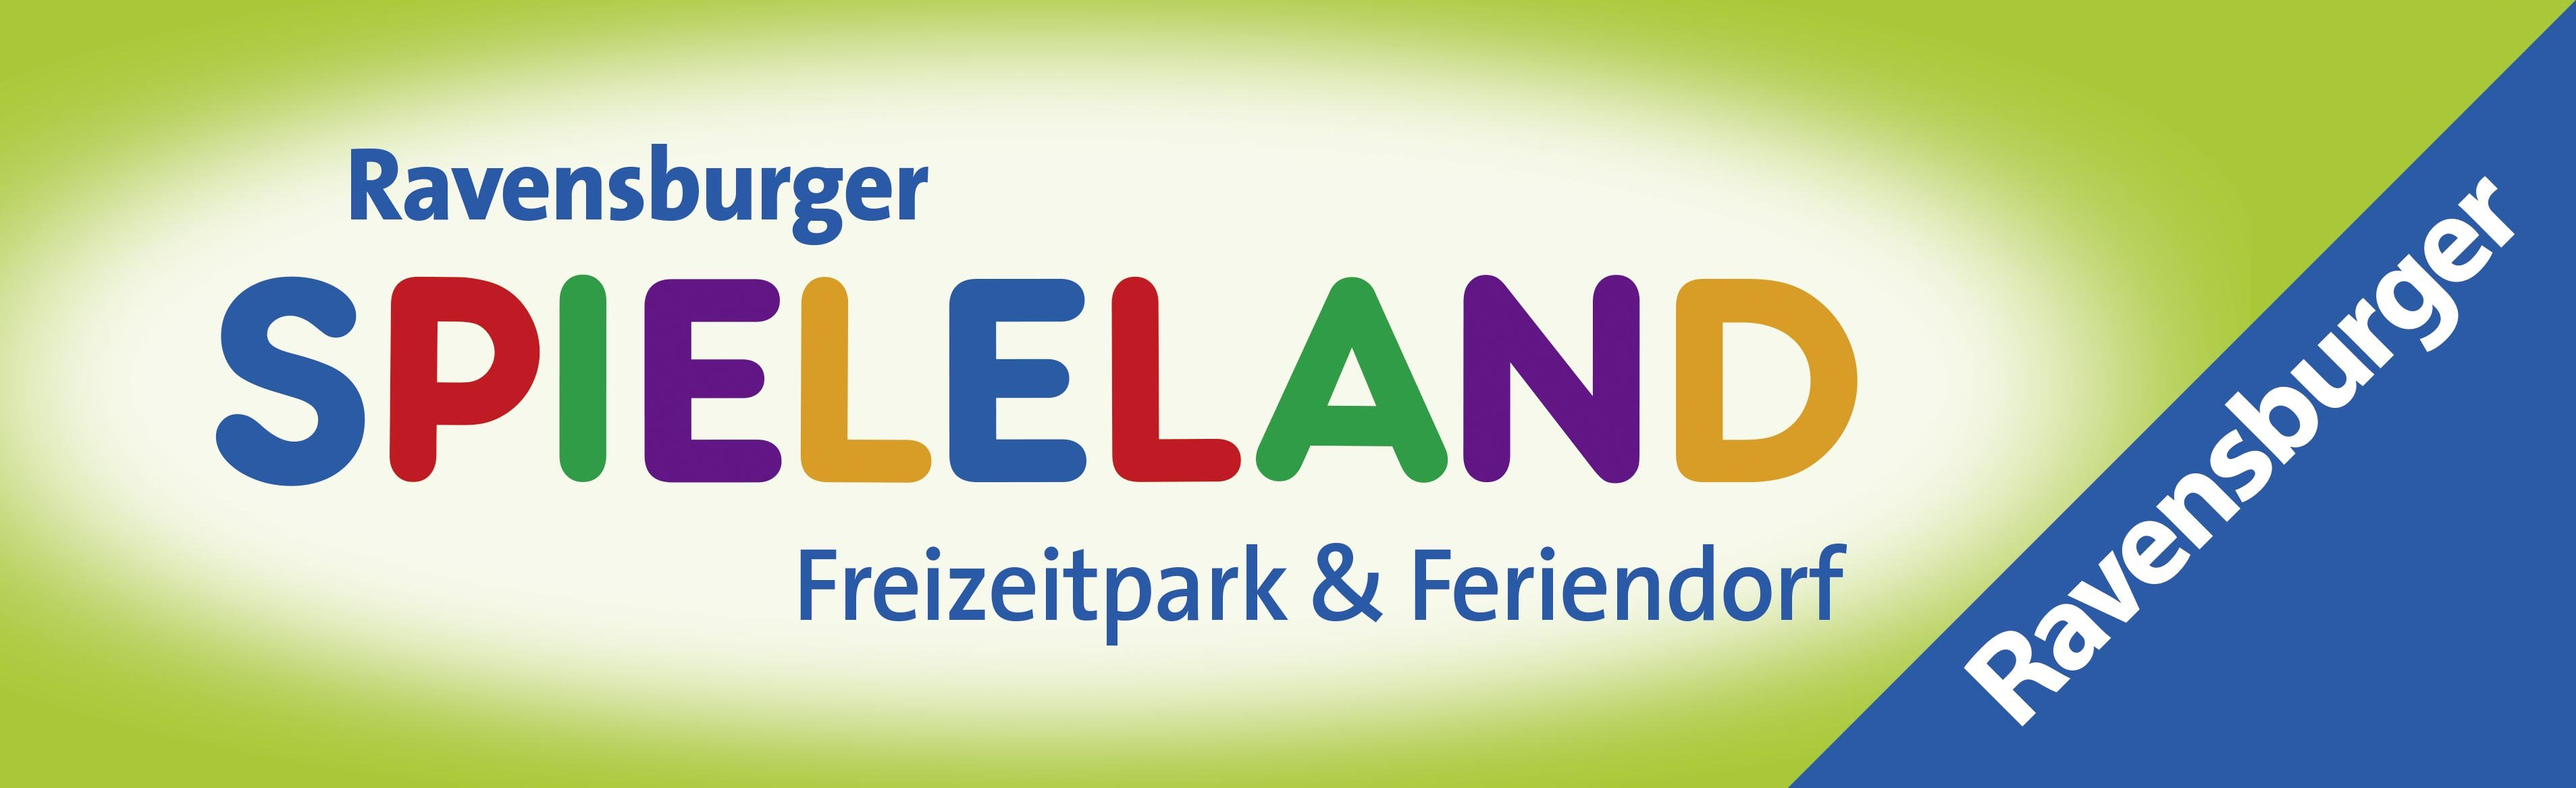 Logo Ravensburger Spieleland